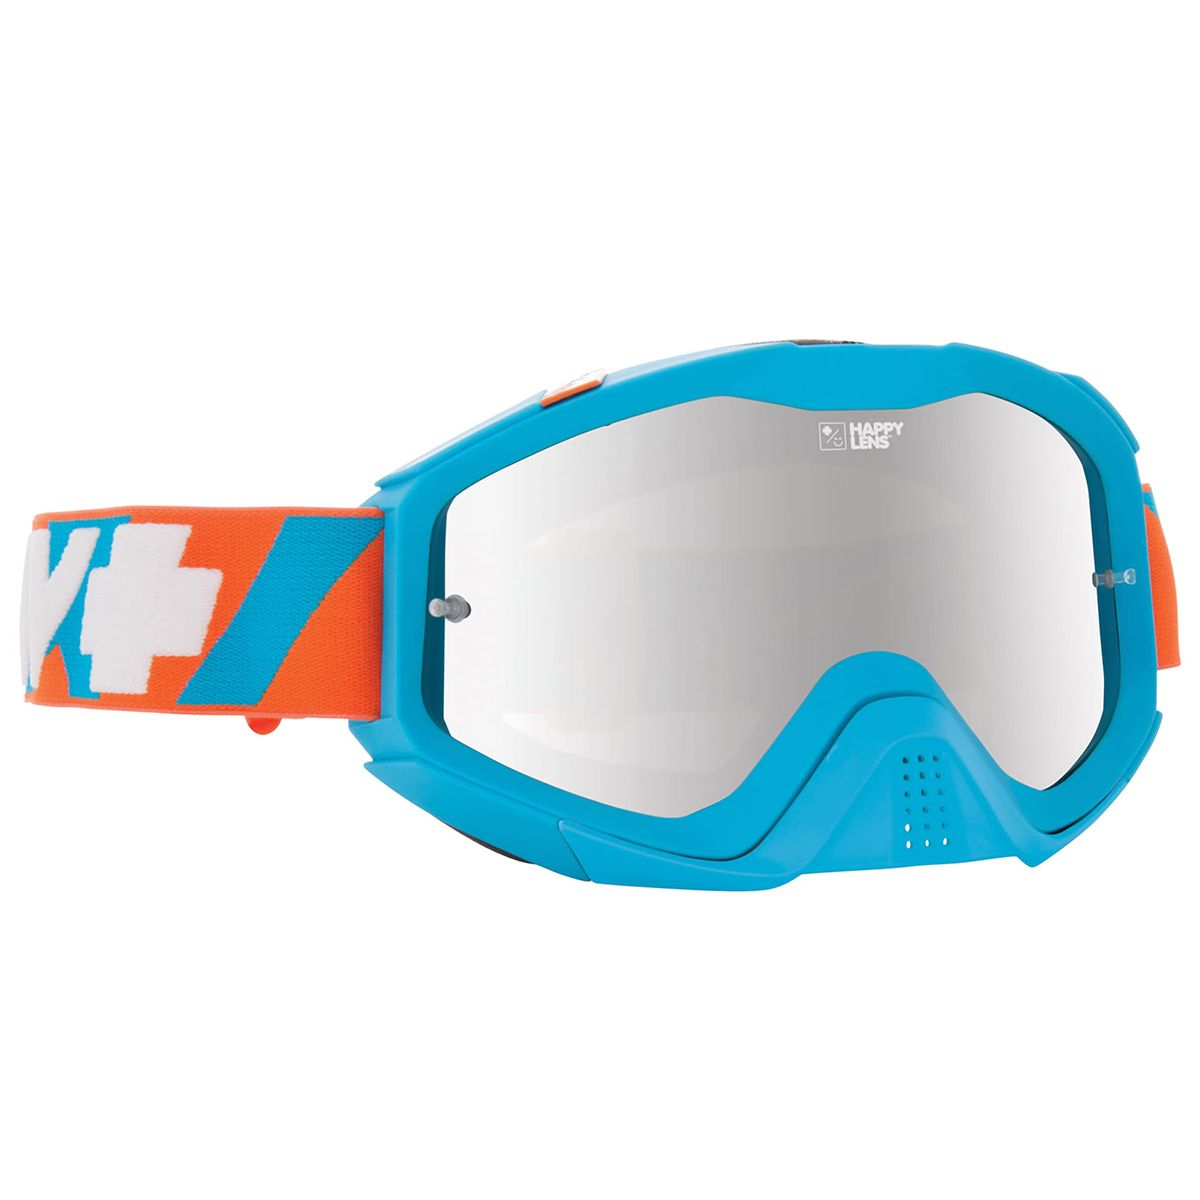 Spy Klutch DNA Happy Lens Blue/Orange/Silver Mirror